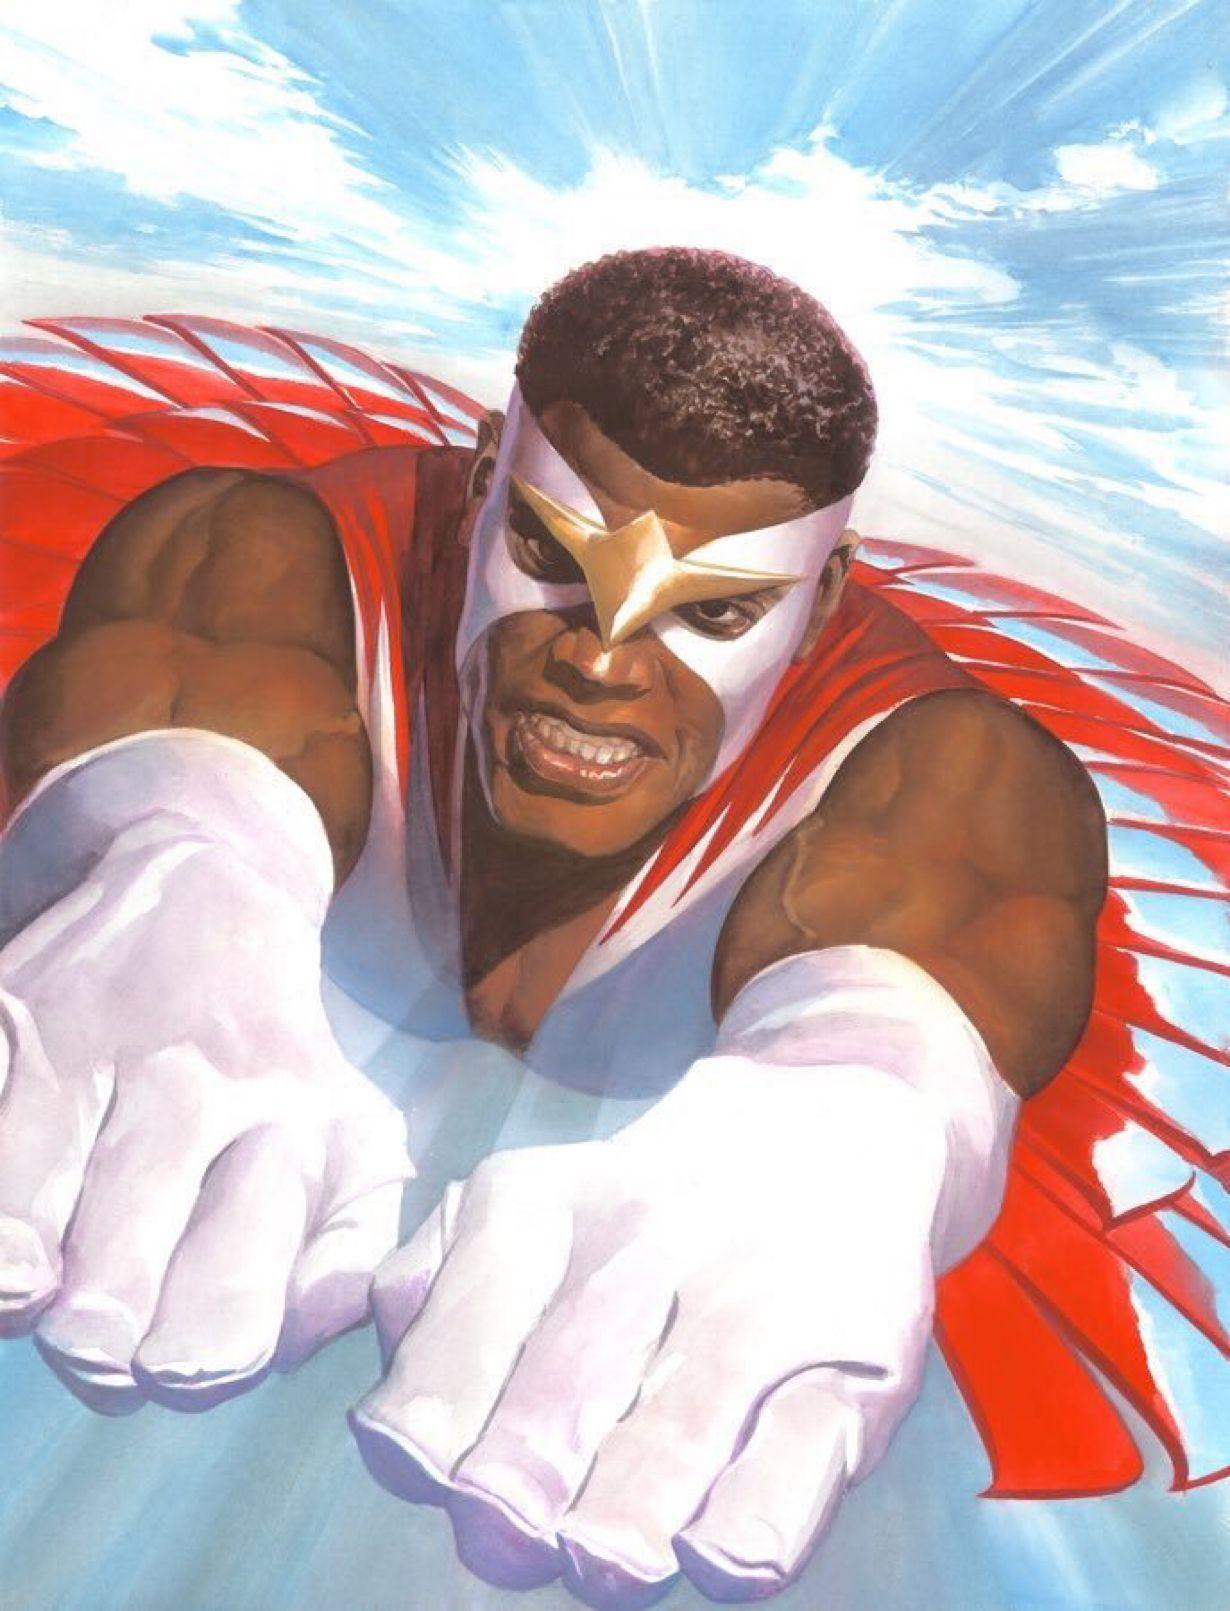 The Falcon by Alex Ross | Marvel comics art, Alex ross, Falcon marvel